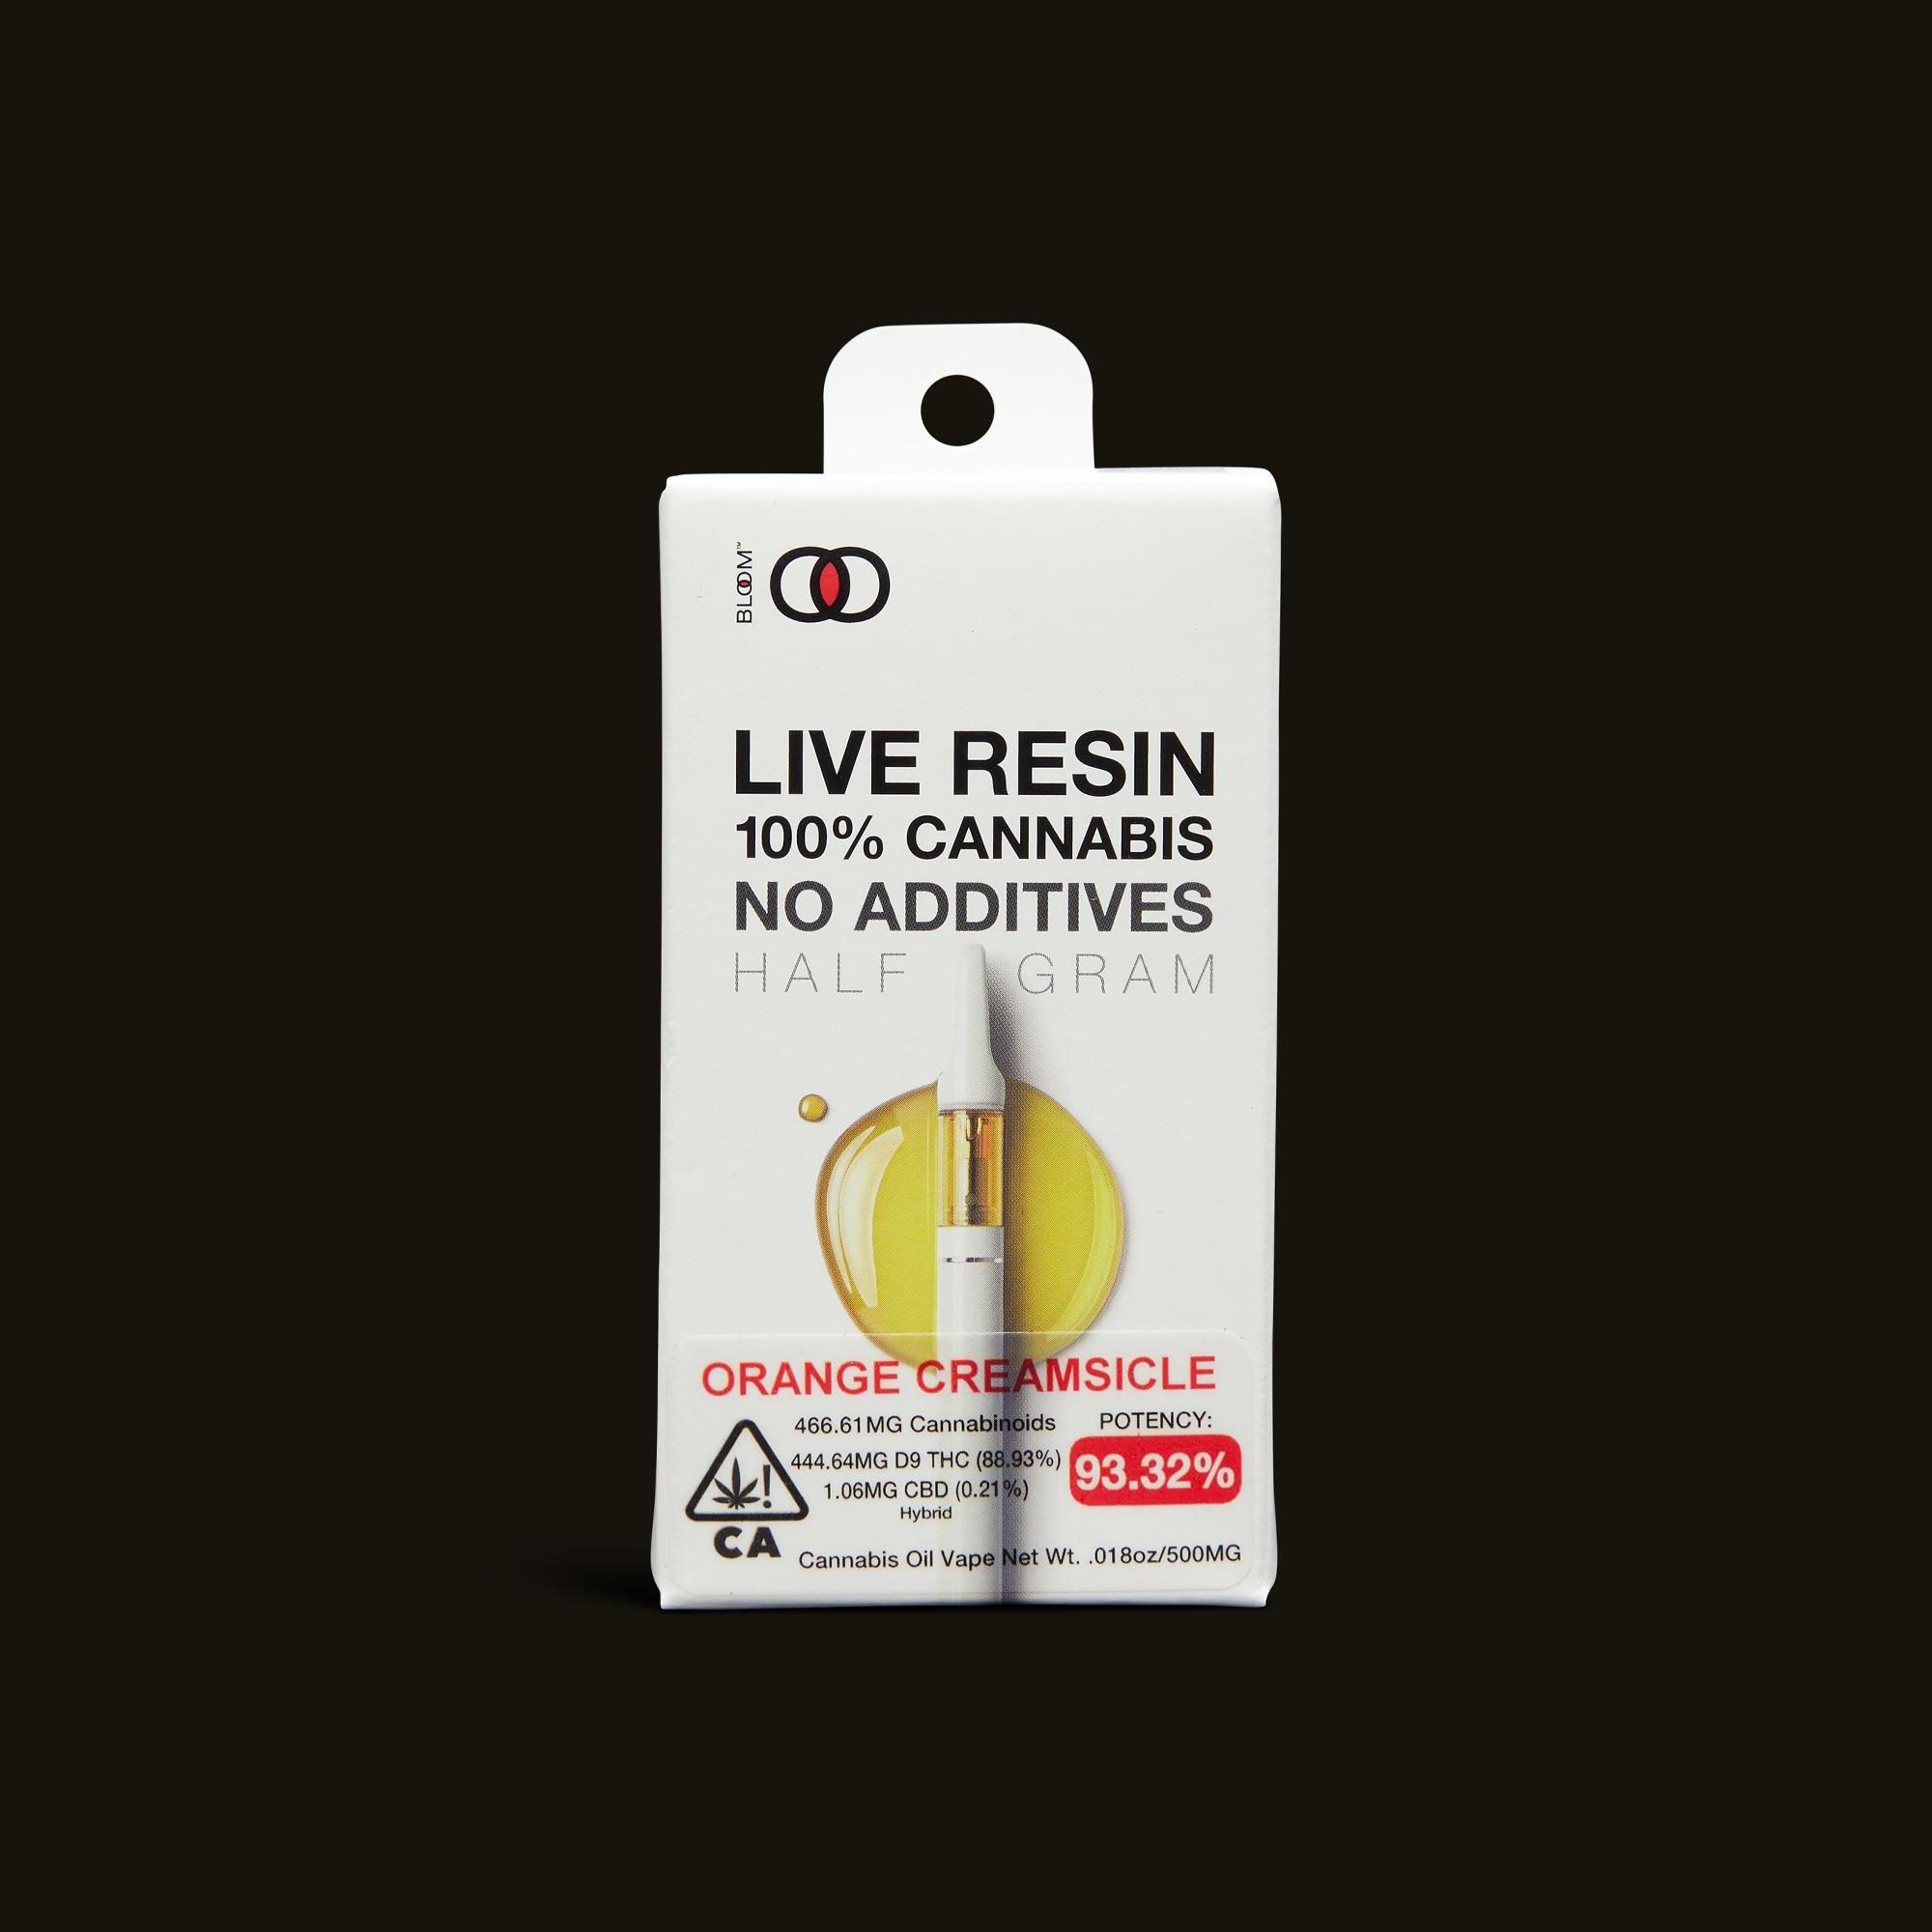 Orange Creamsicle Live Resin Cartridge - 1g - 1g cartridge